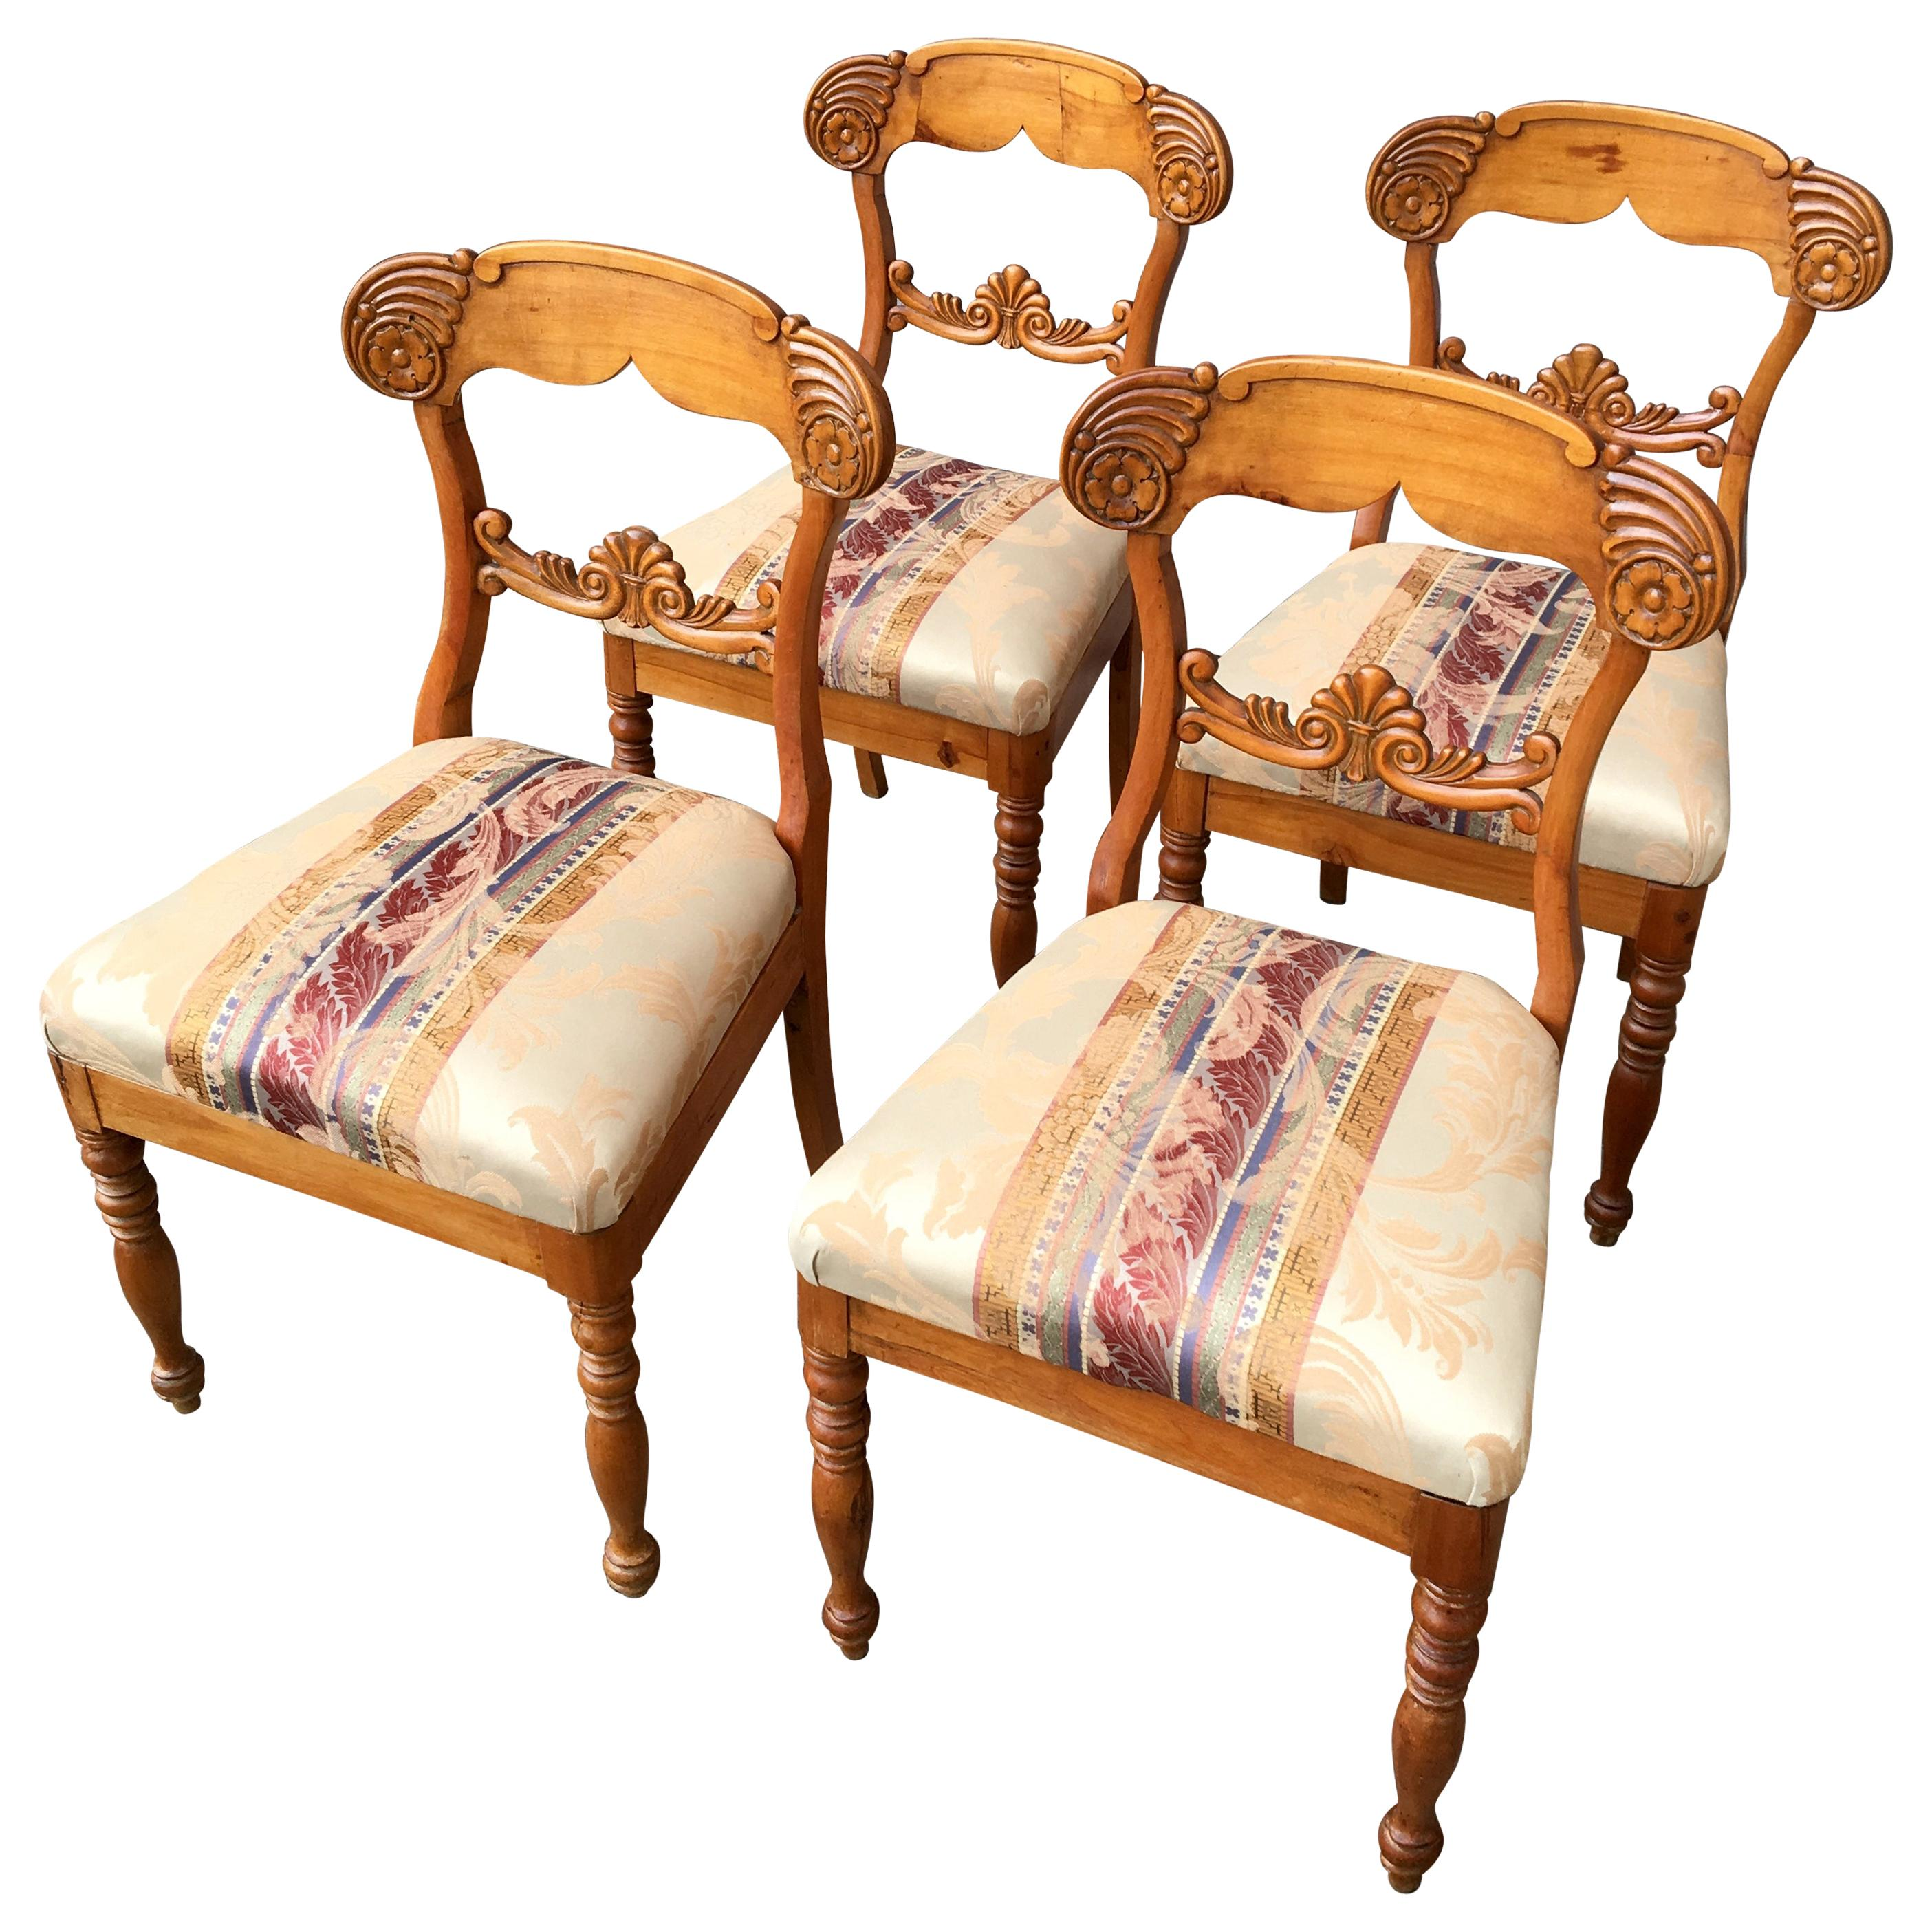 Set Of 4 19th Century Biedermeier Dining Room Chairs, Sweden